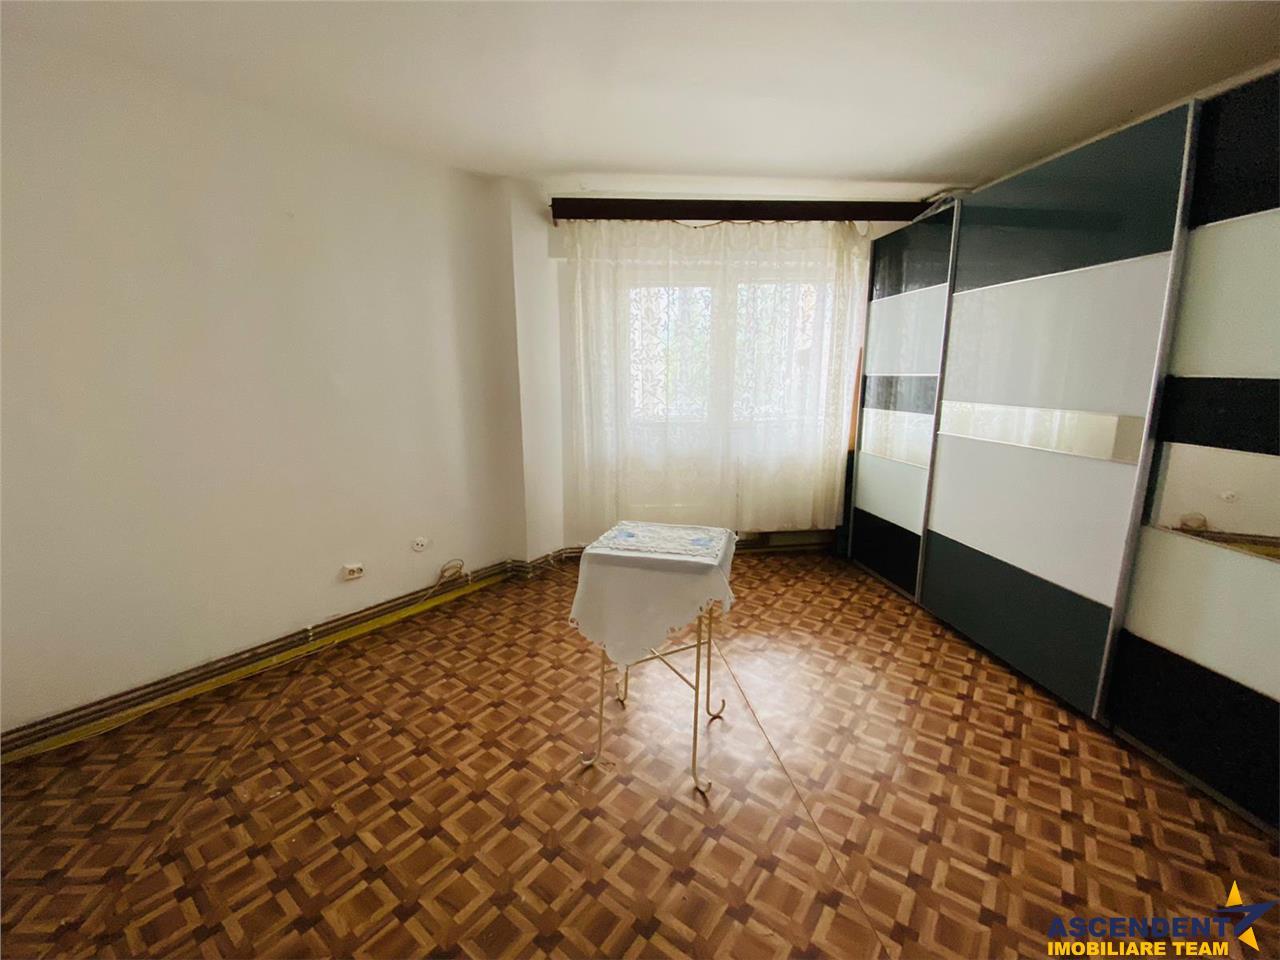 OFERTA TRANZACTIONATA!! Mica ta resedinta amplasata intro zona de maxim interes, Zizinului, Brasov